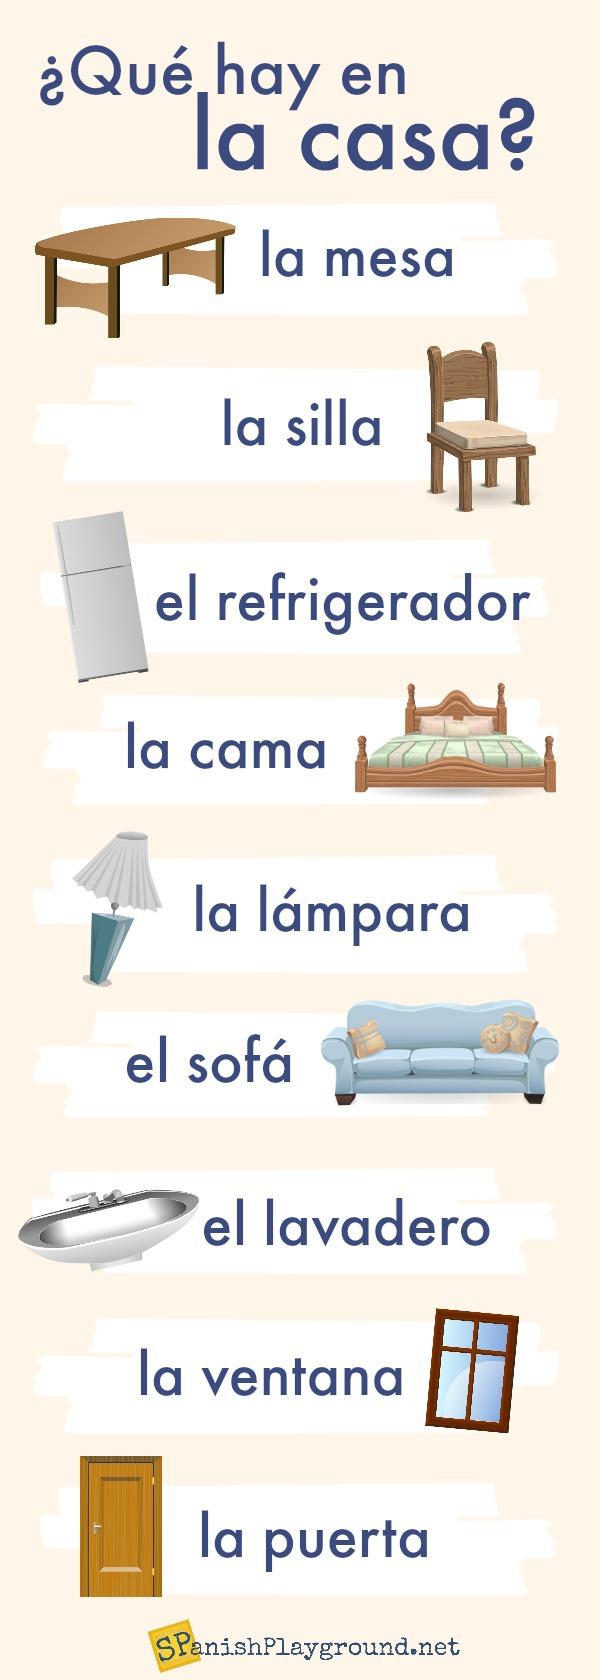 hight resolution of Spanish House Vocabulary Activities for Kids - Spanish Playground